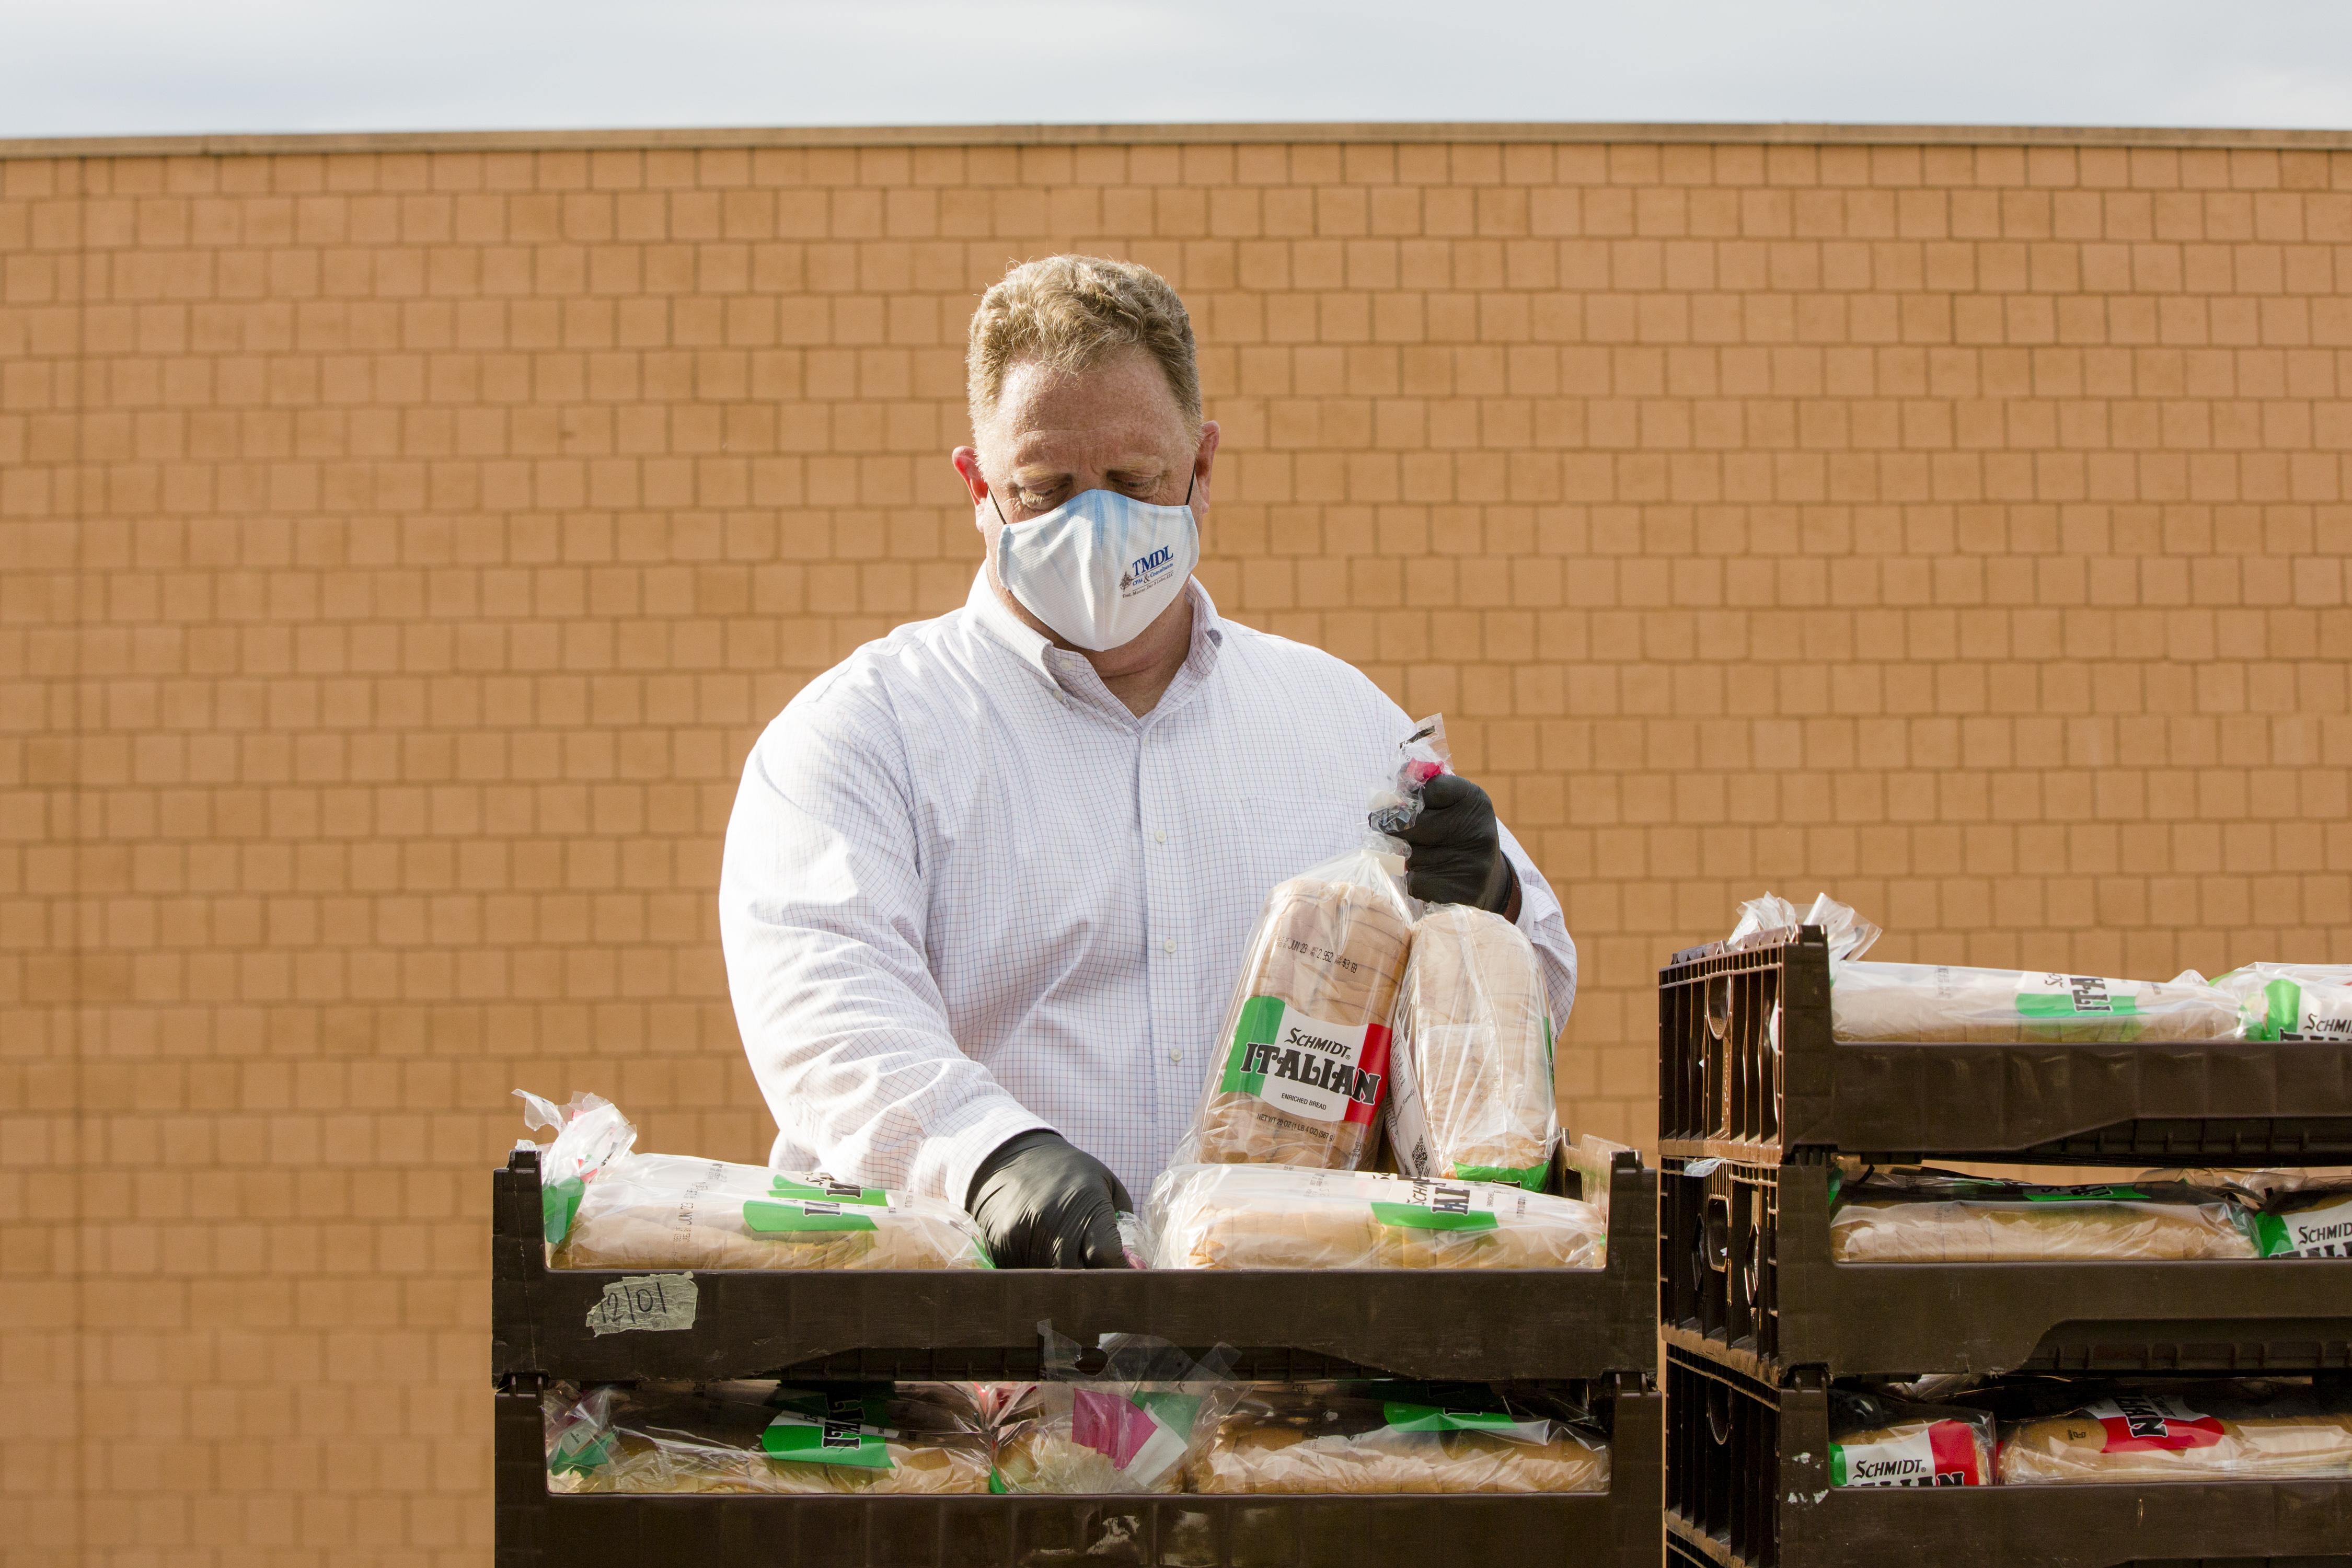 UWCM volunteer prepares stacks of bread during food handout event